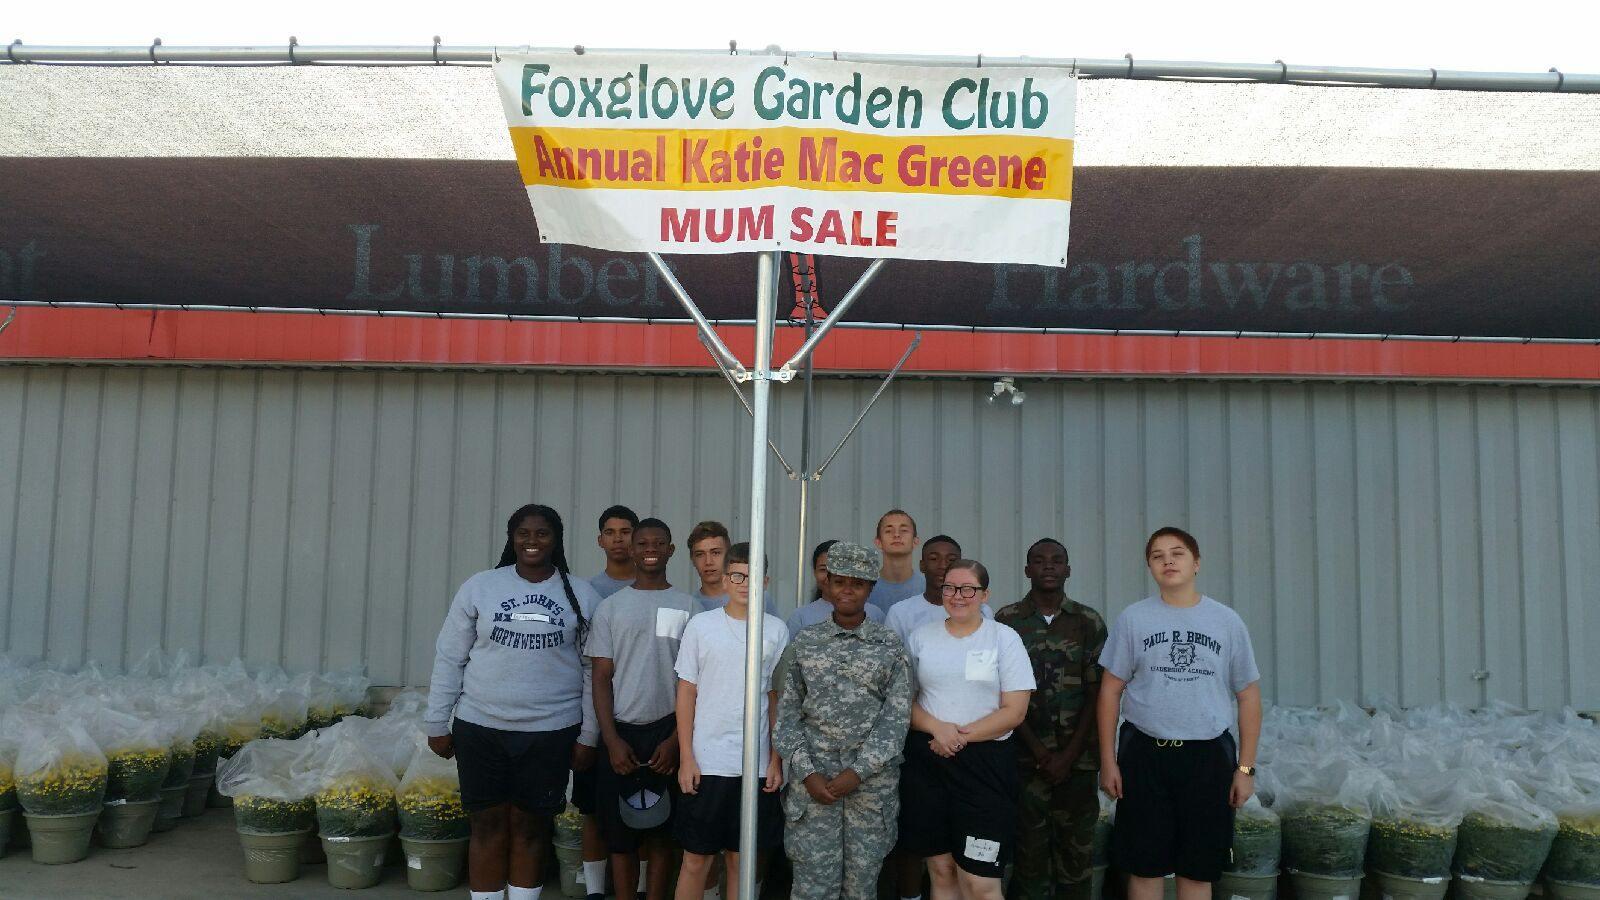 Foxglove Garden Club7